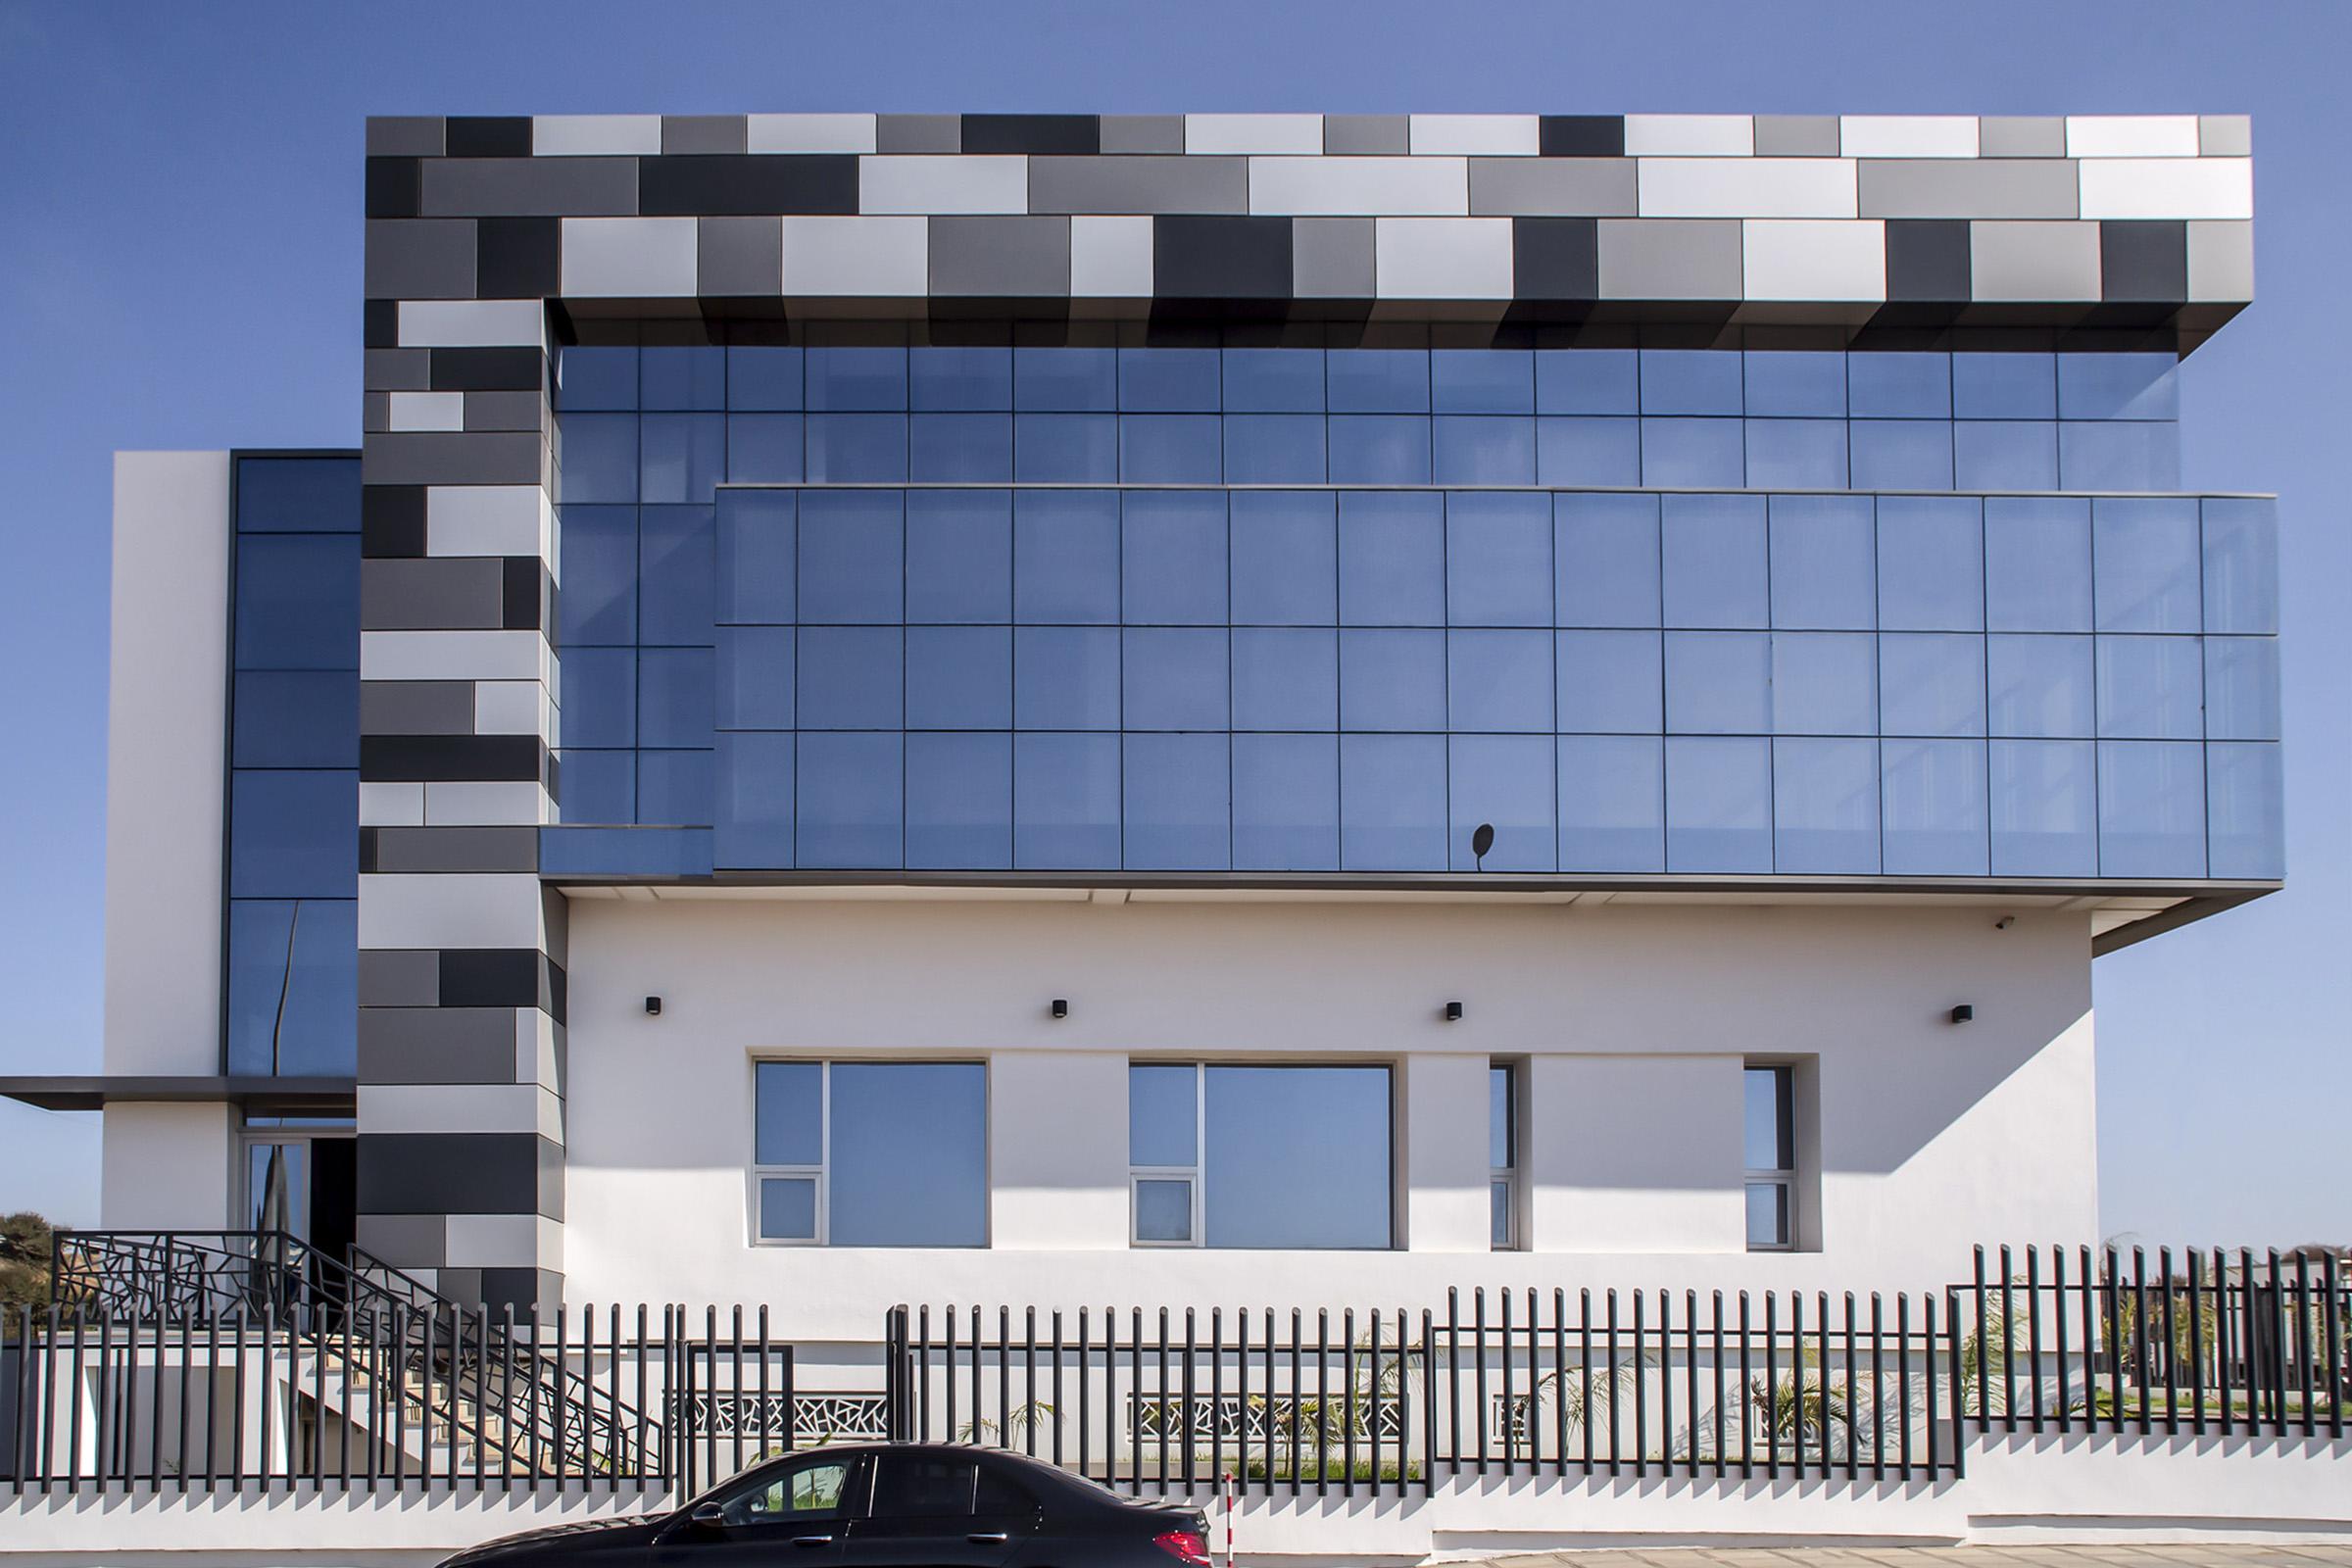 hyatt-negoce-ain-atiq-sede-central-STB-458